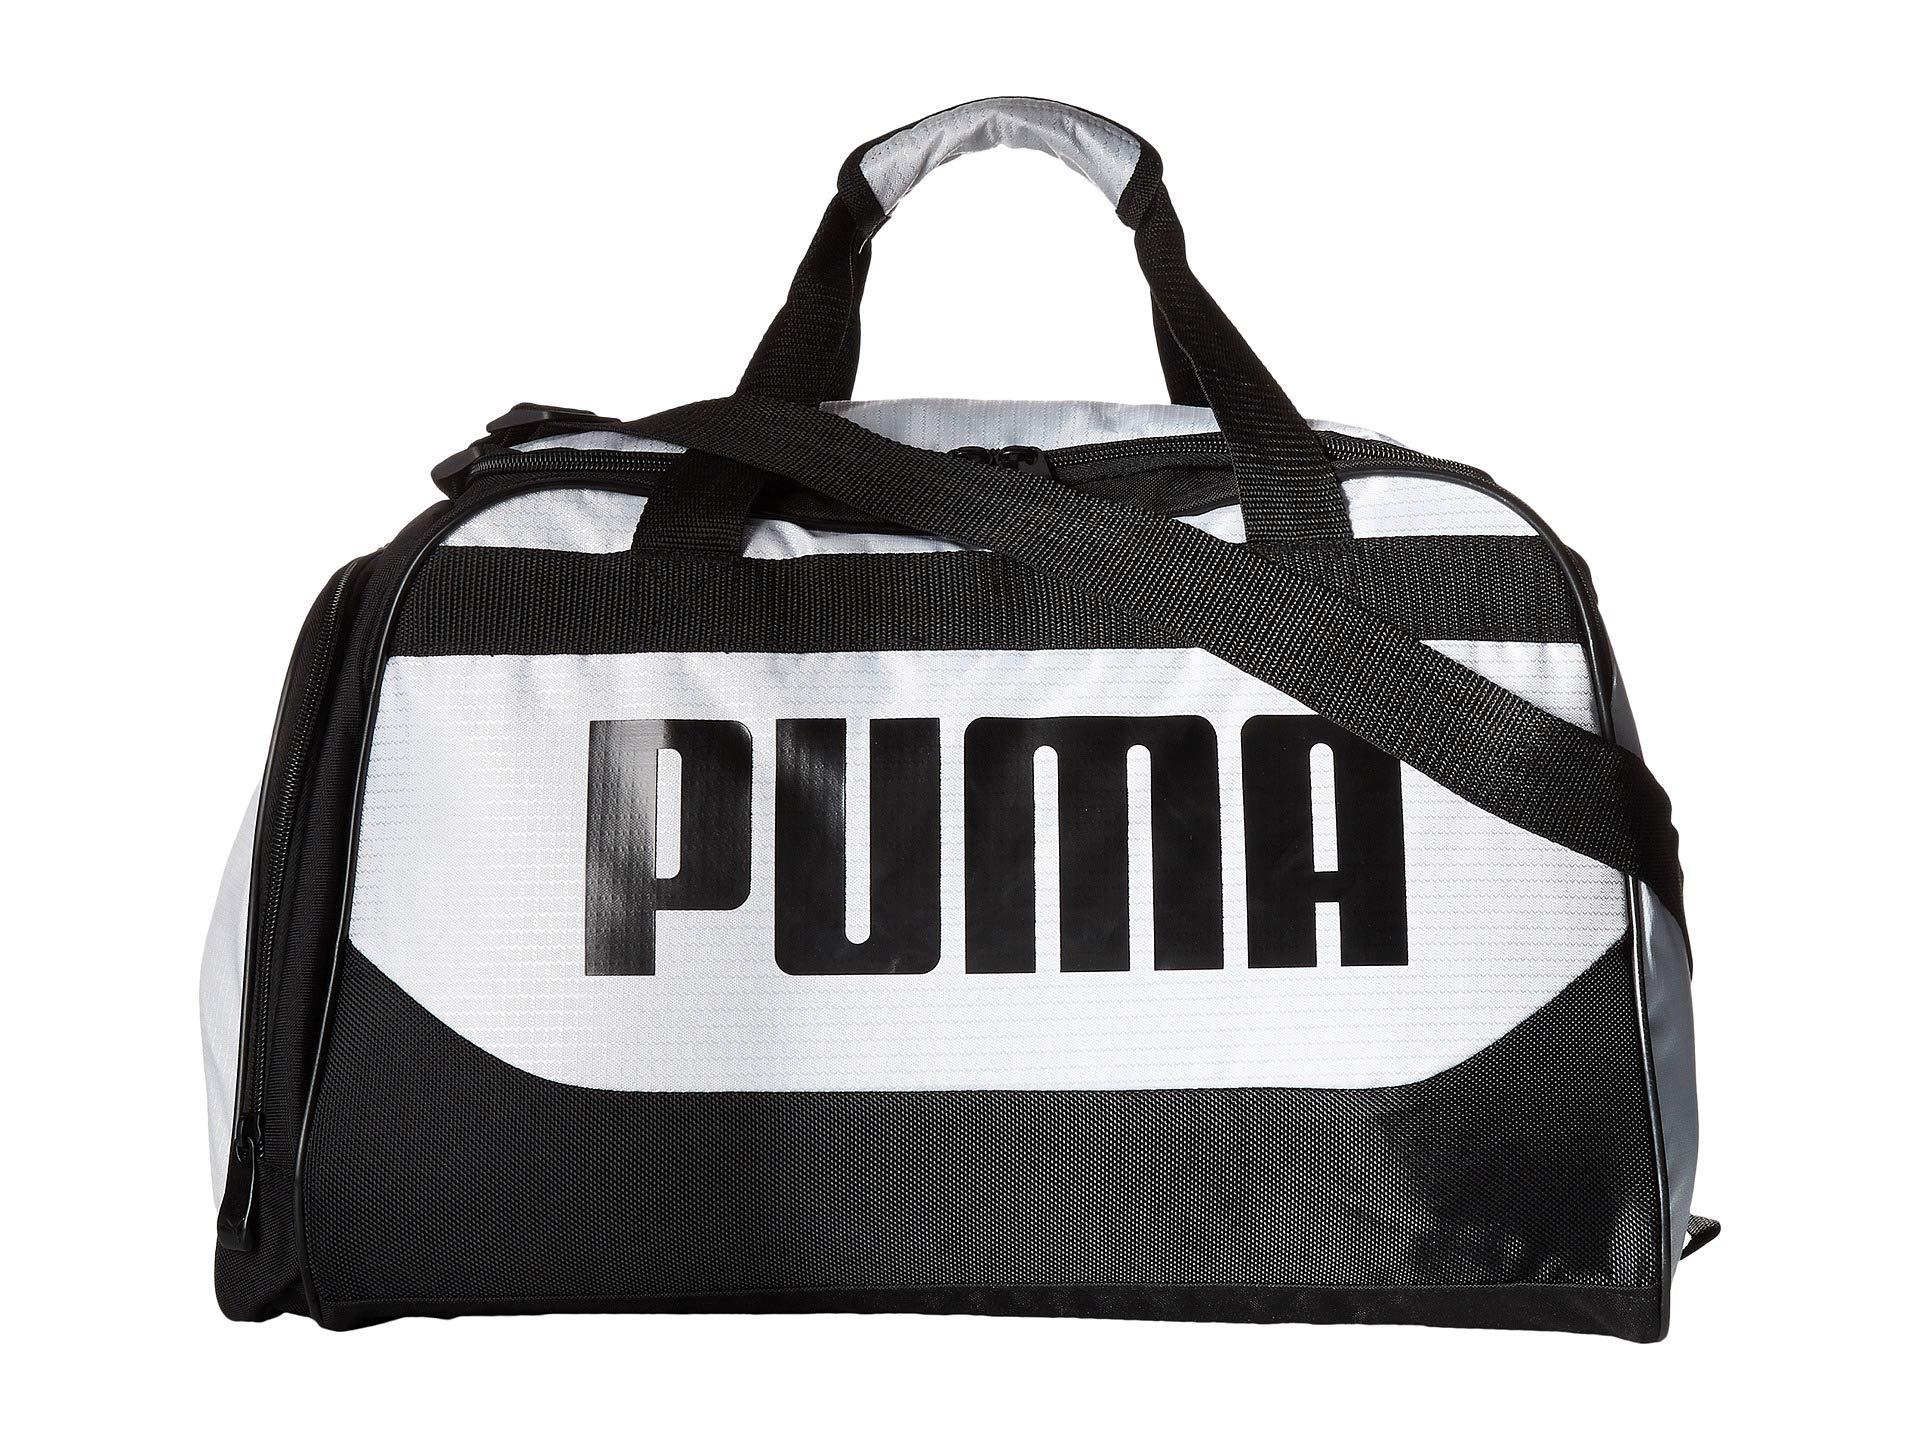 Bolso de Lona para Hombre PUMA Evercat Transformation 3.0 Duffel  + PUMA en VeoyCompro.net